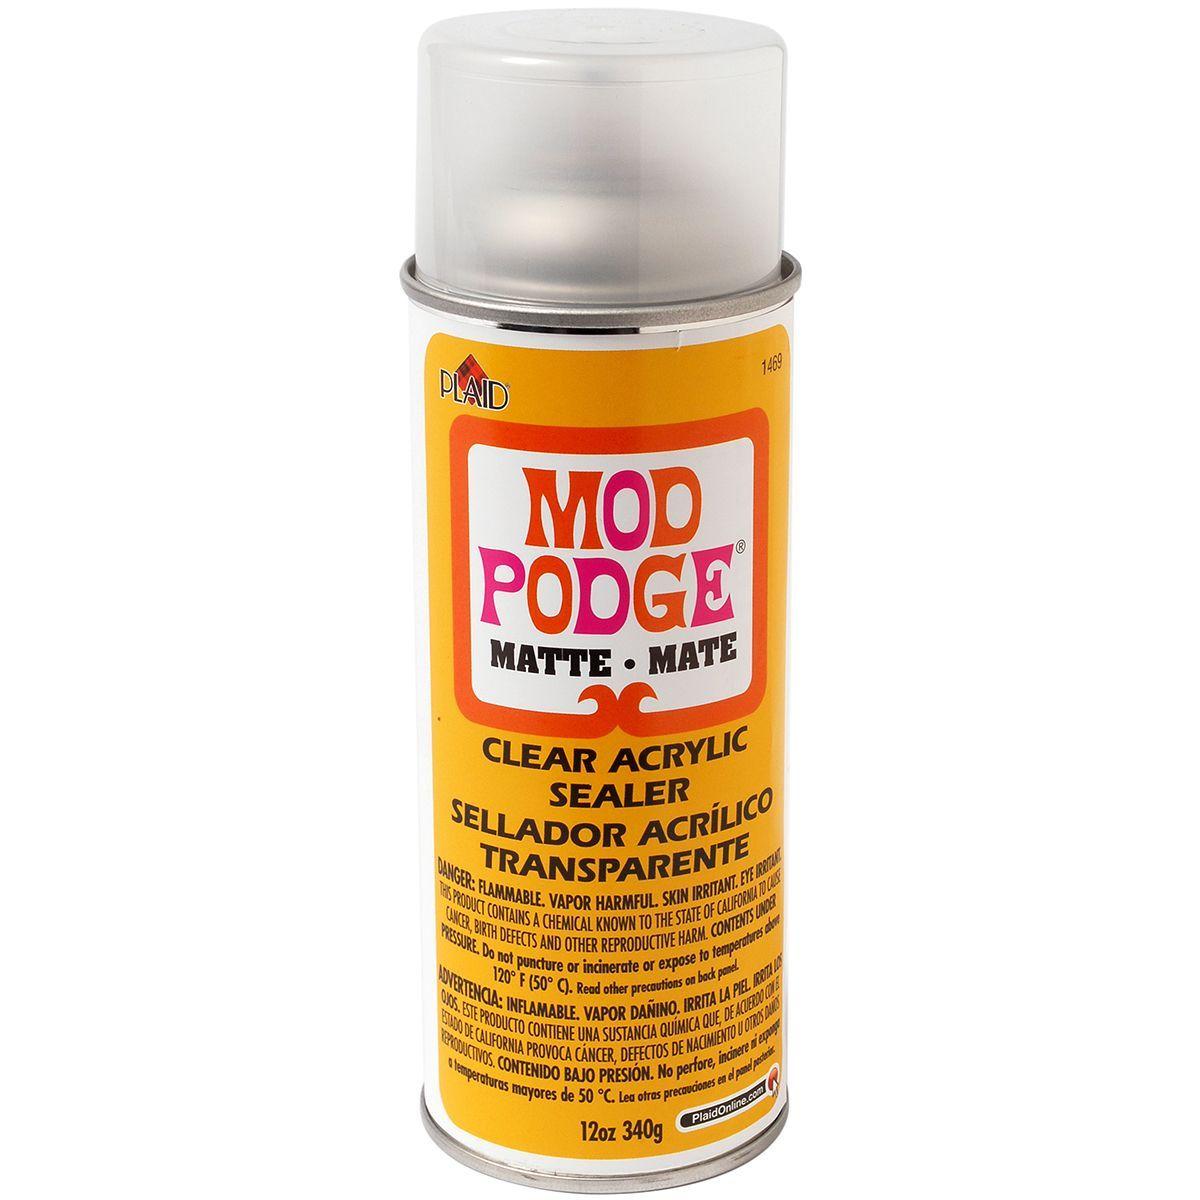 Mod Podge Clear Matte Acrylic Aerosol Sealer (12 ounces